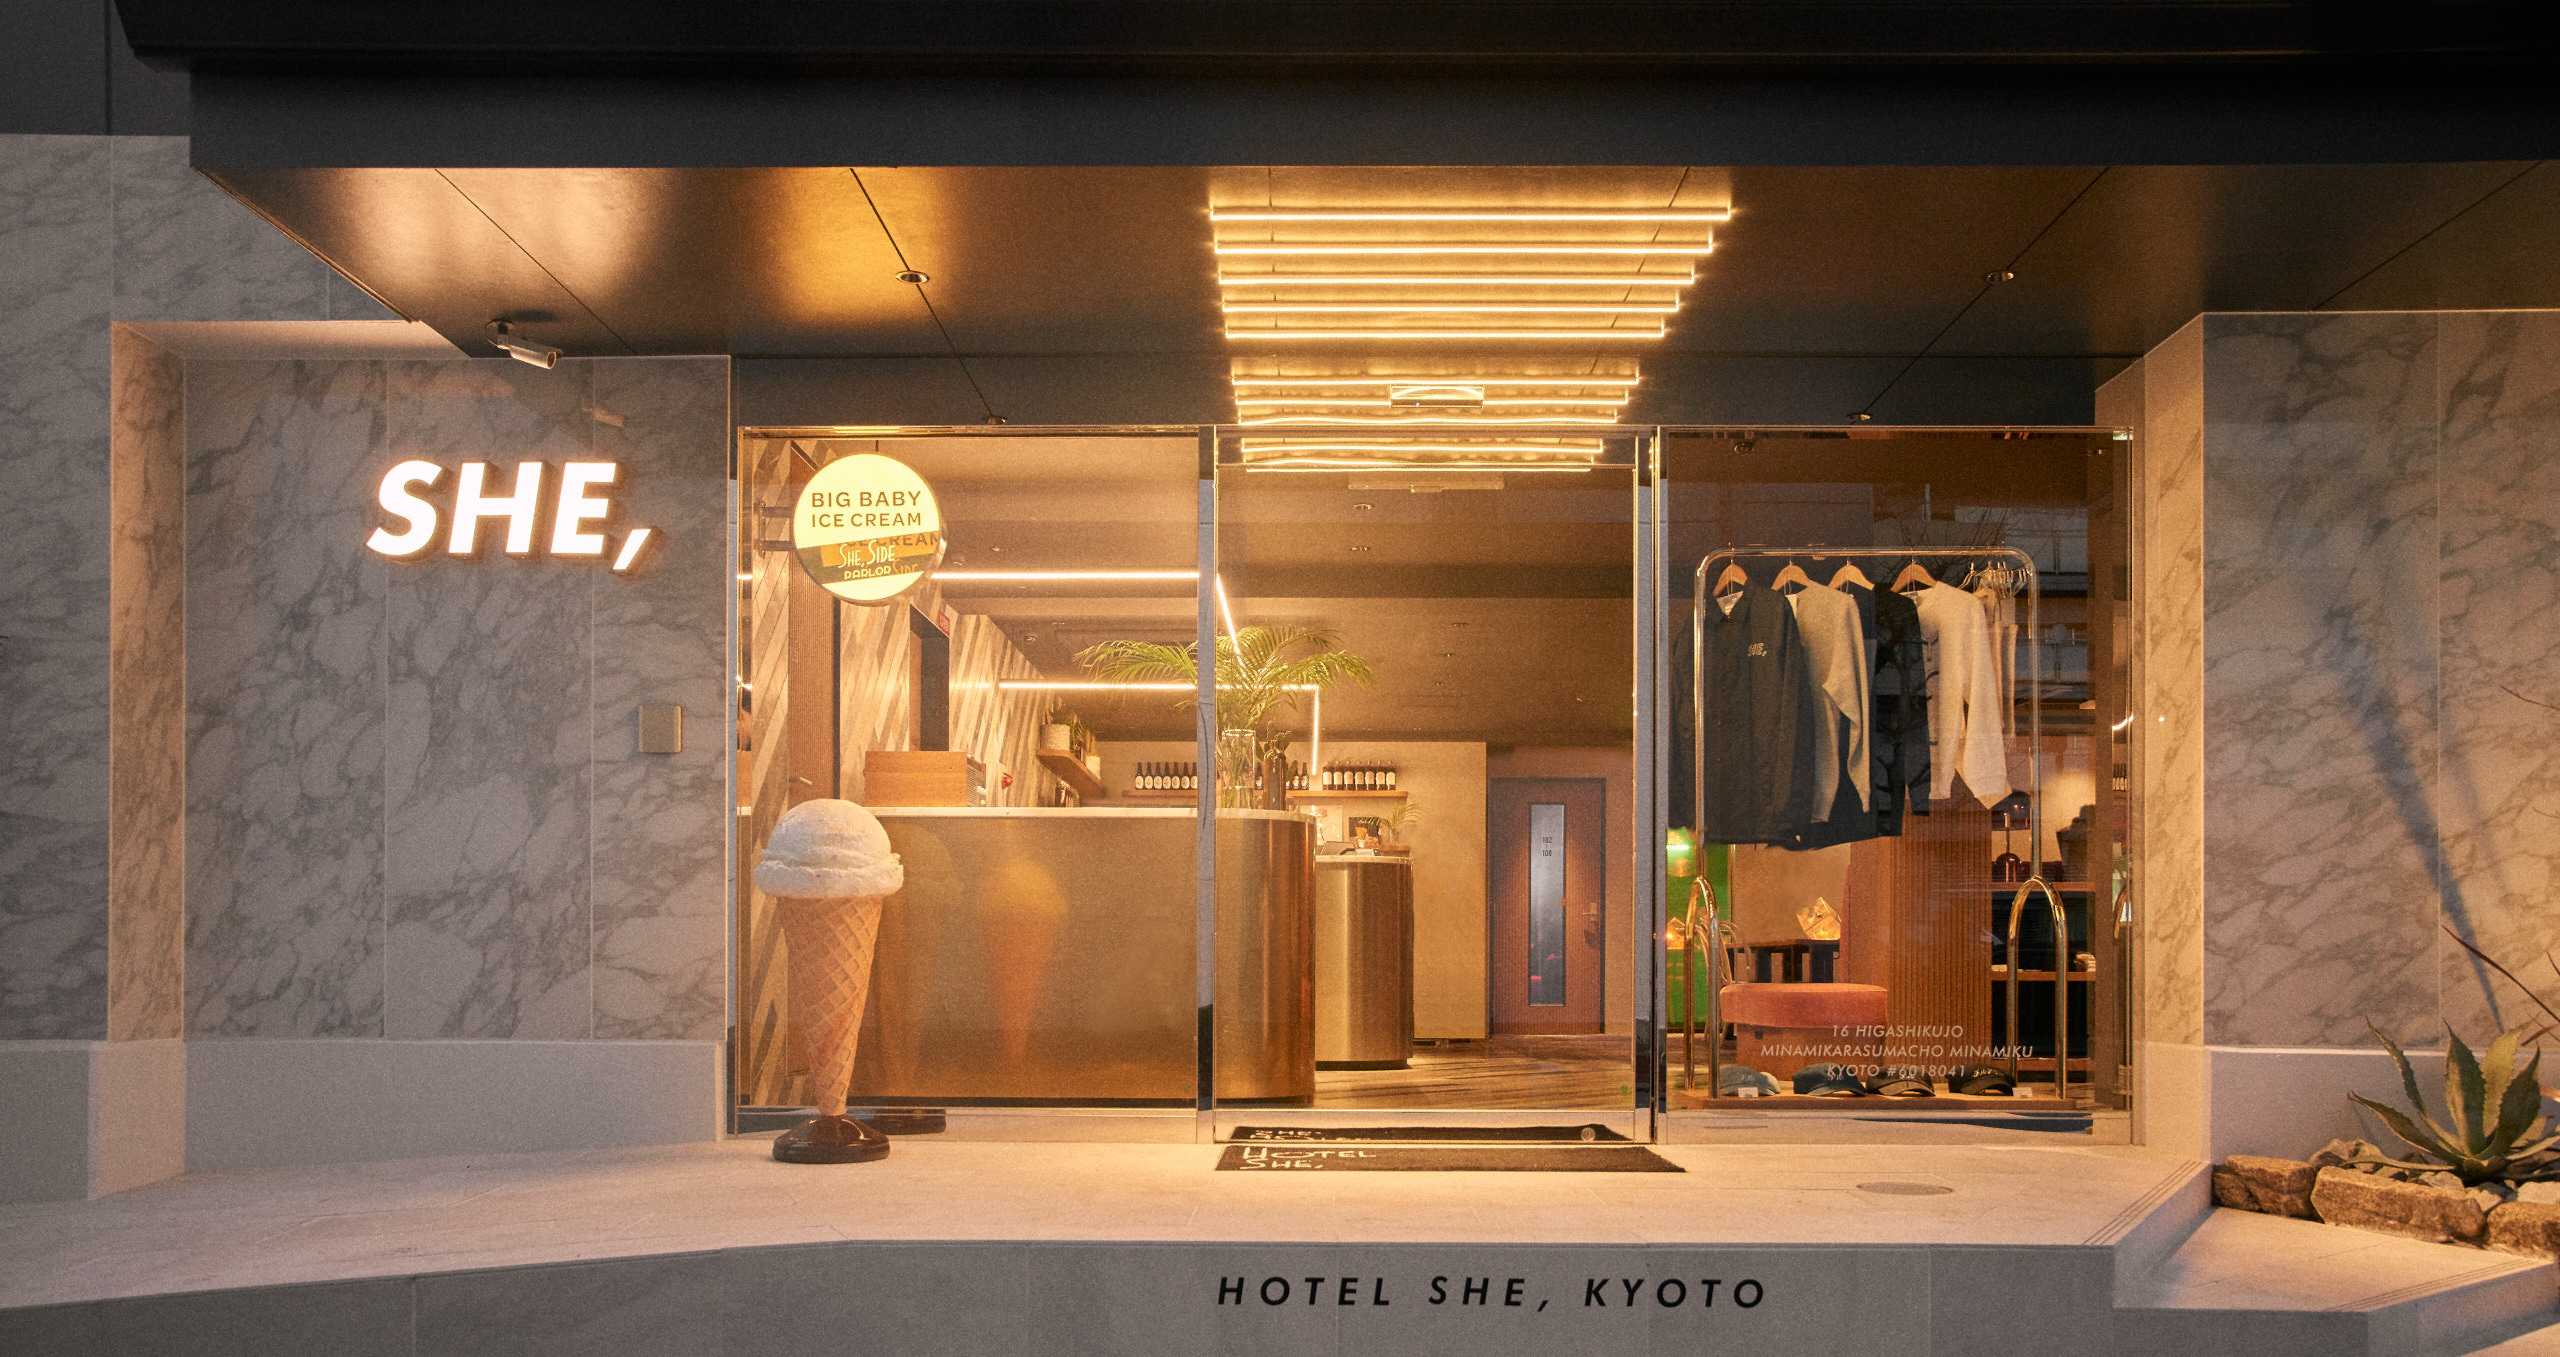 HOTEL SHE,KYOTO